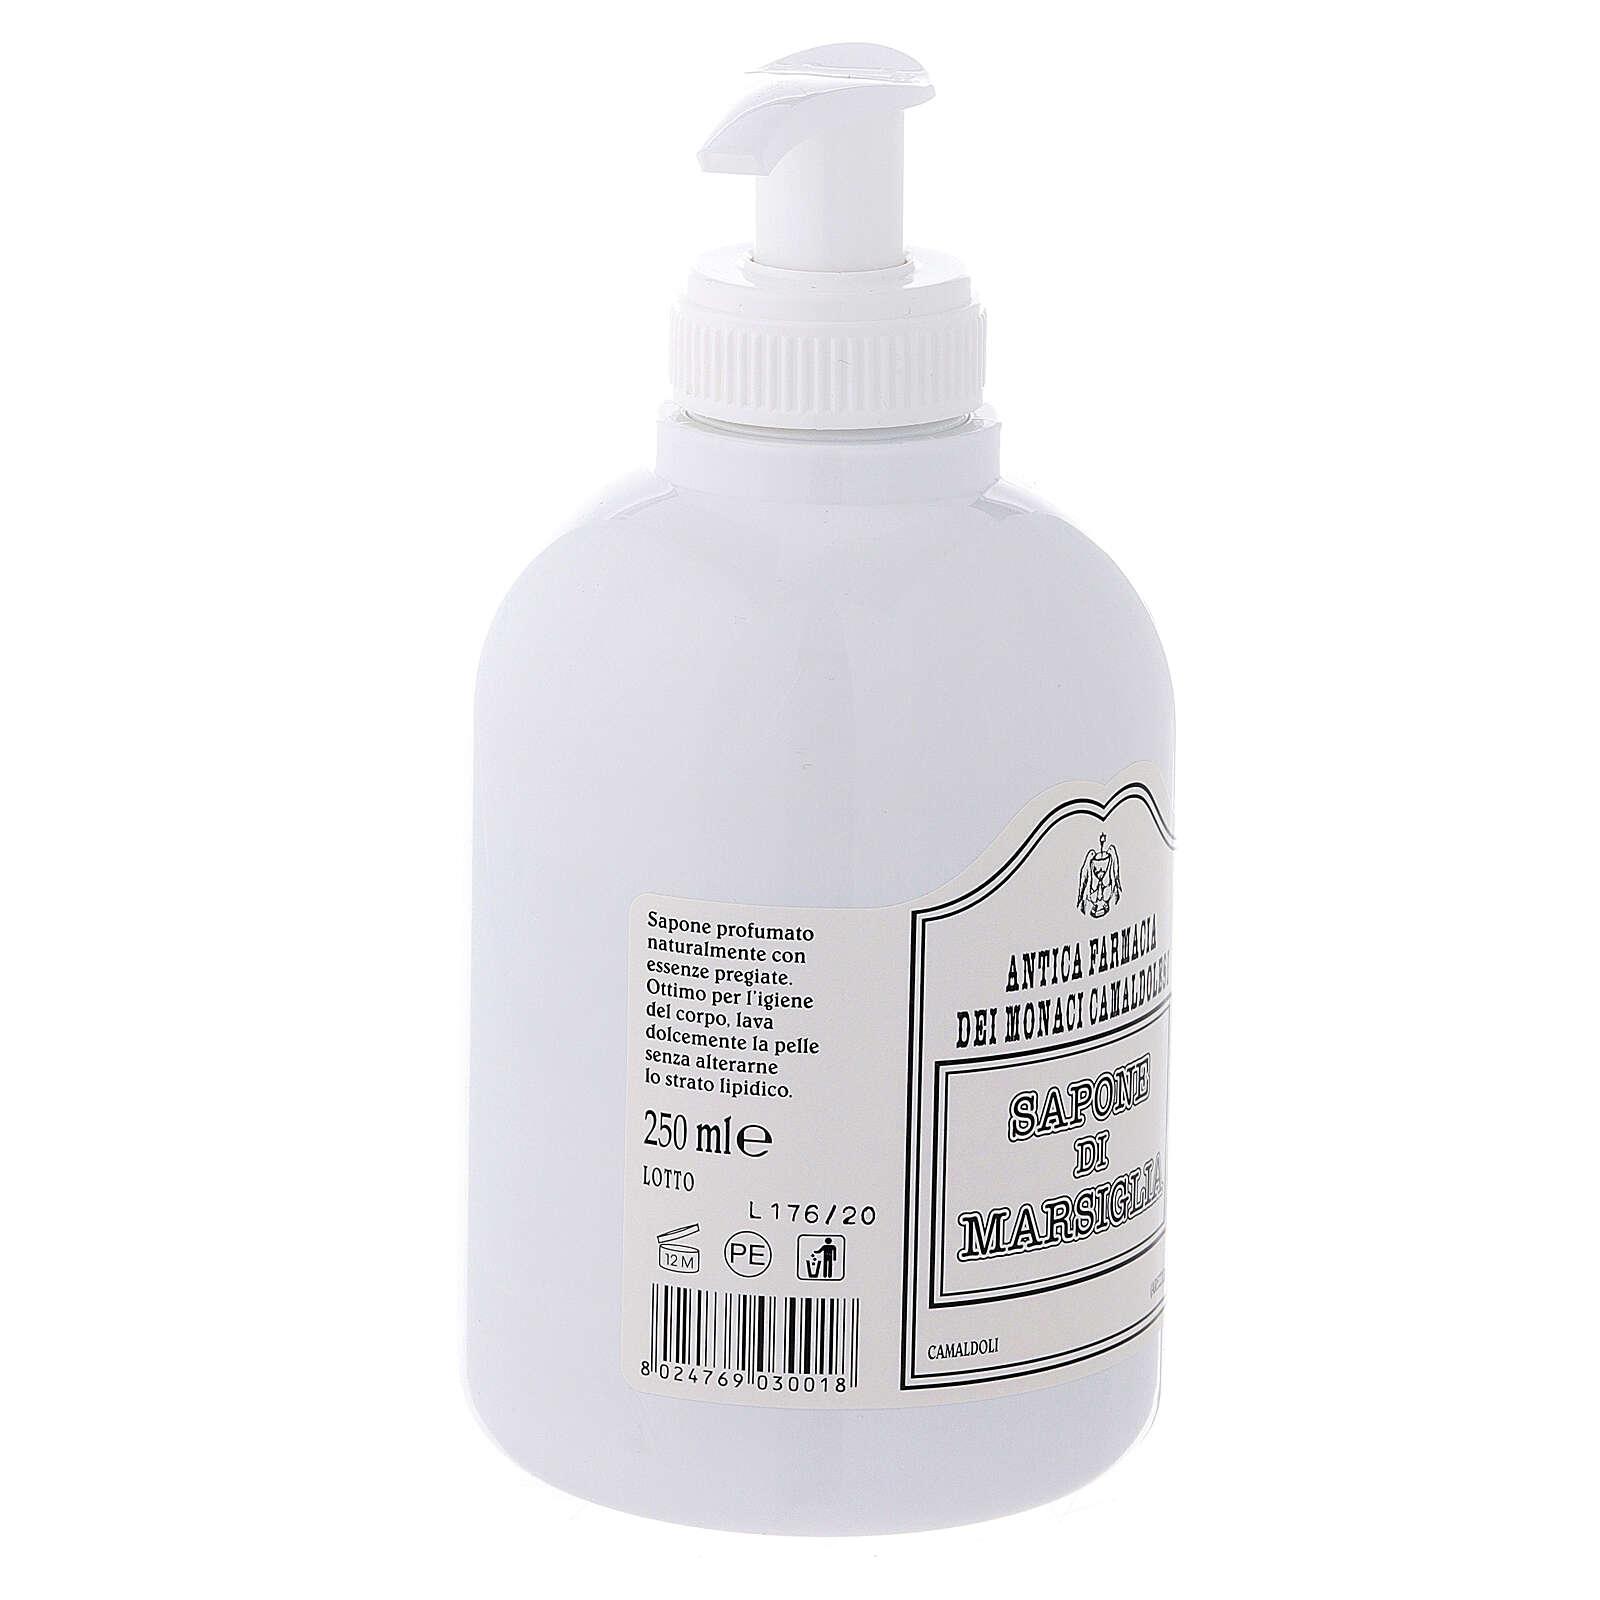 Liquid Marseille soap 250 ml Camaldoli 4